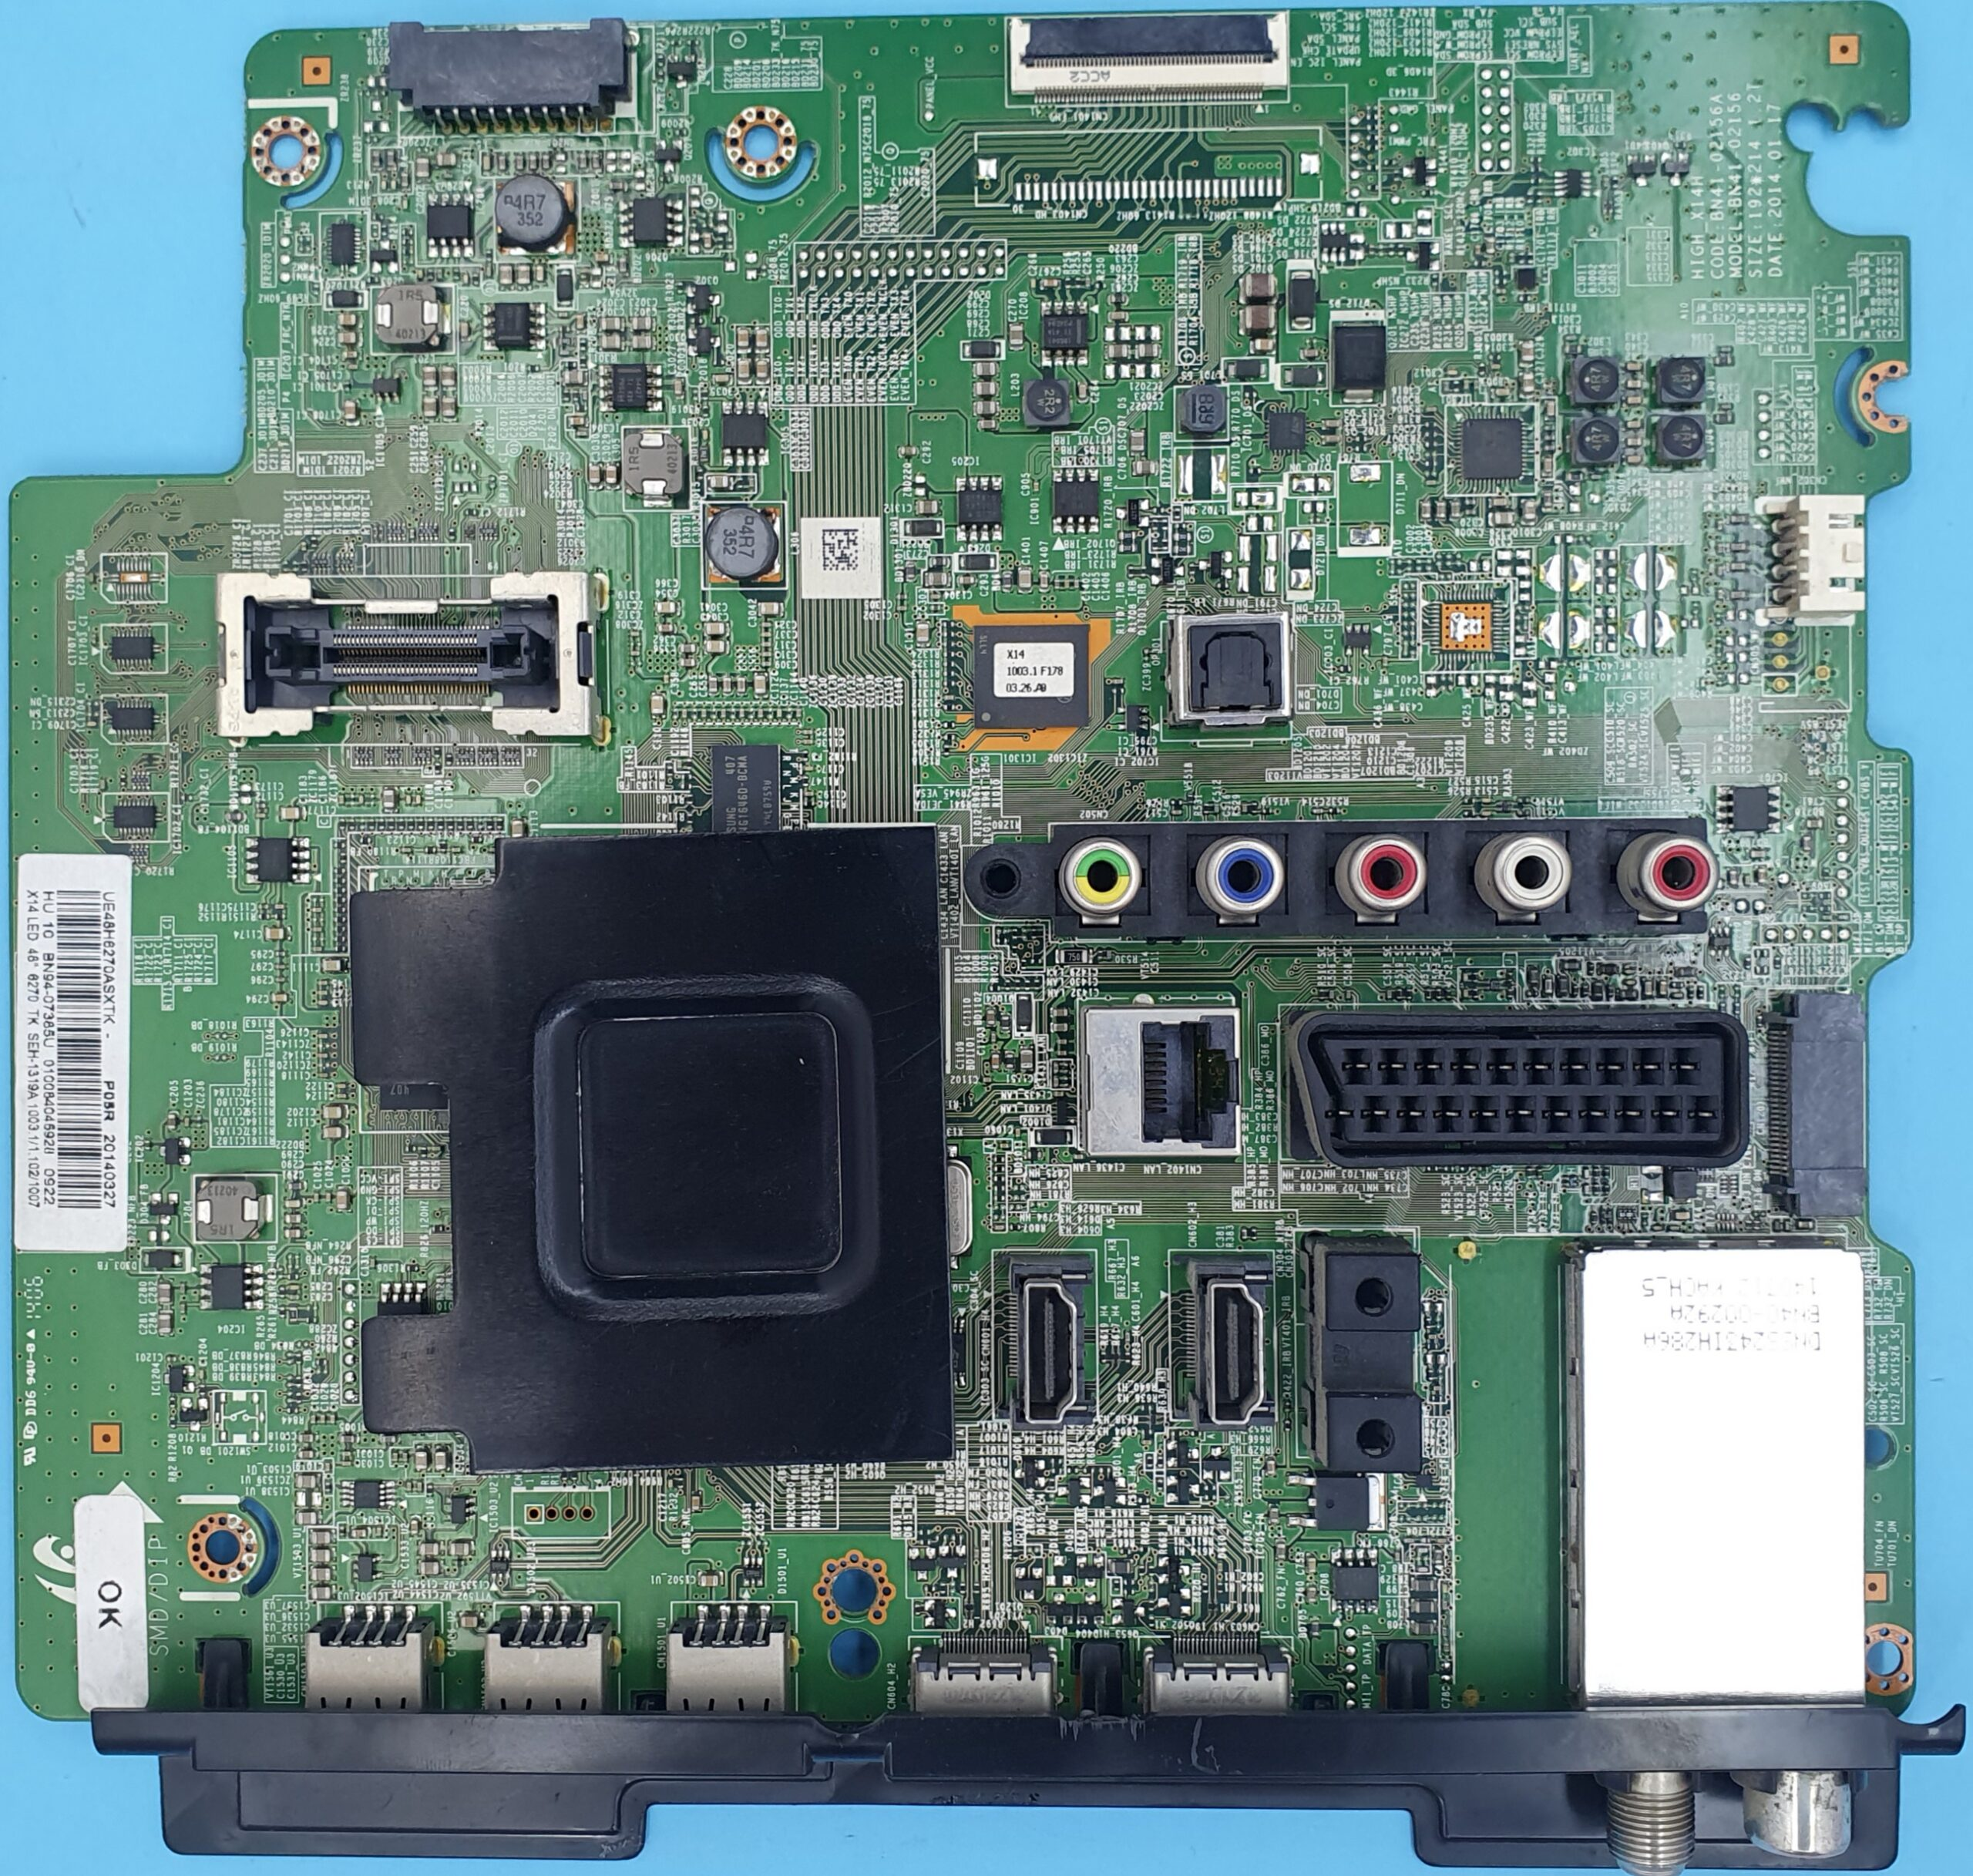 BN94-07385U Samsung Anakart (KDV DAHİL = 400 TL)